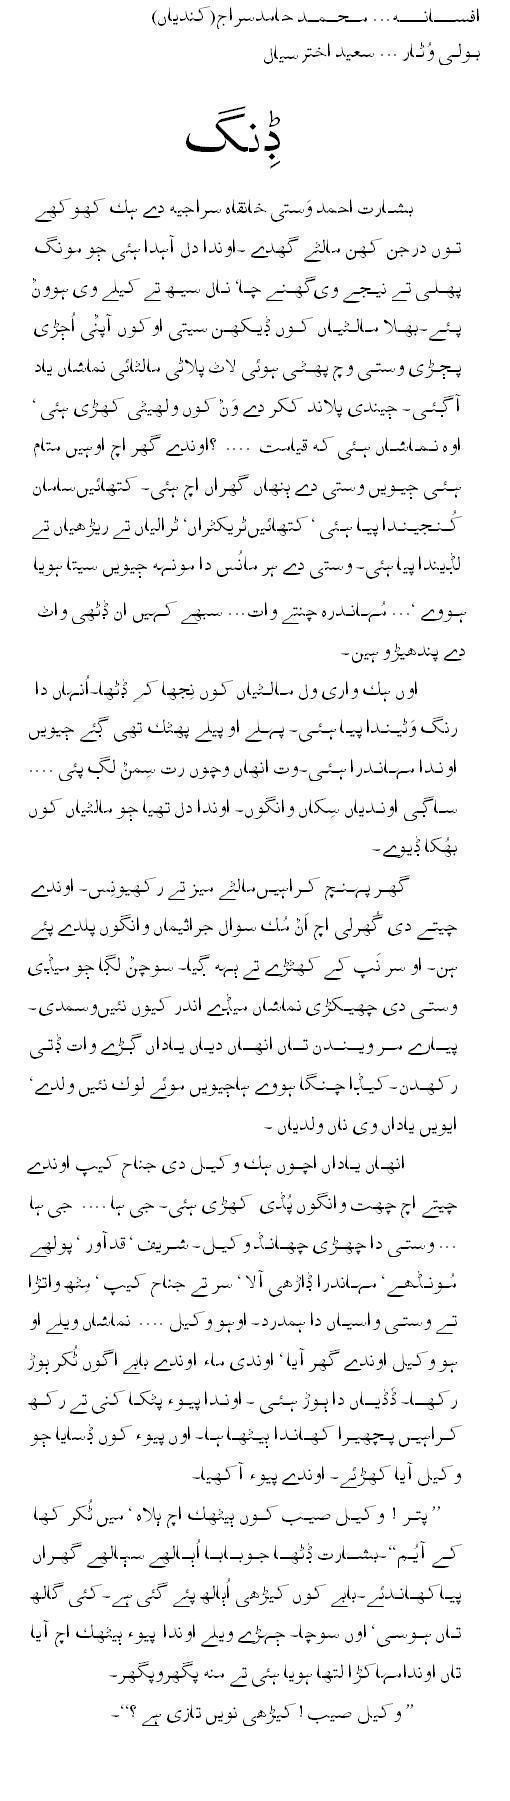 Dding (Hamid Siraj/ Translator Saeed Akhtar Zia) - Part 1